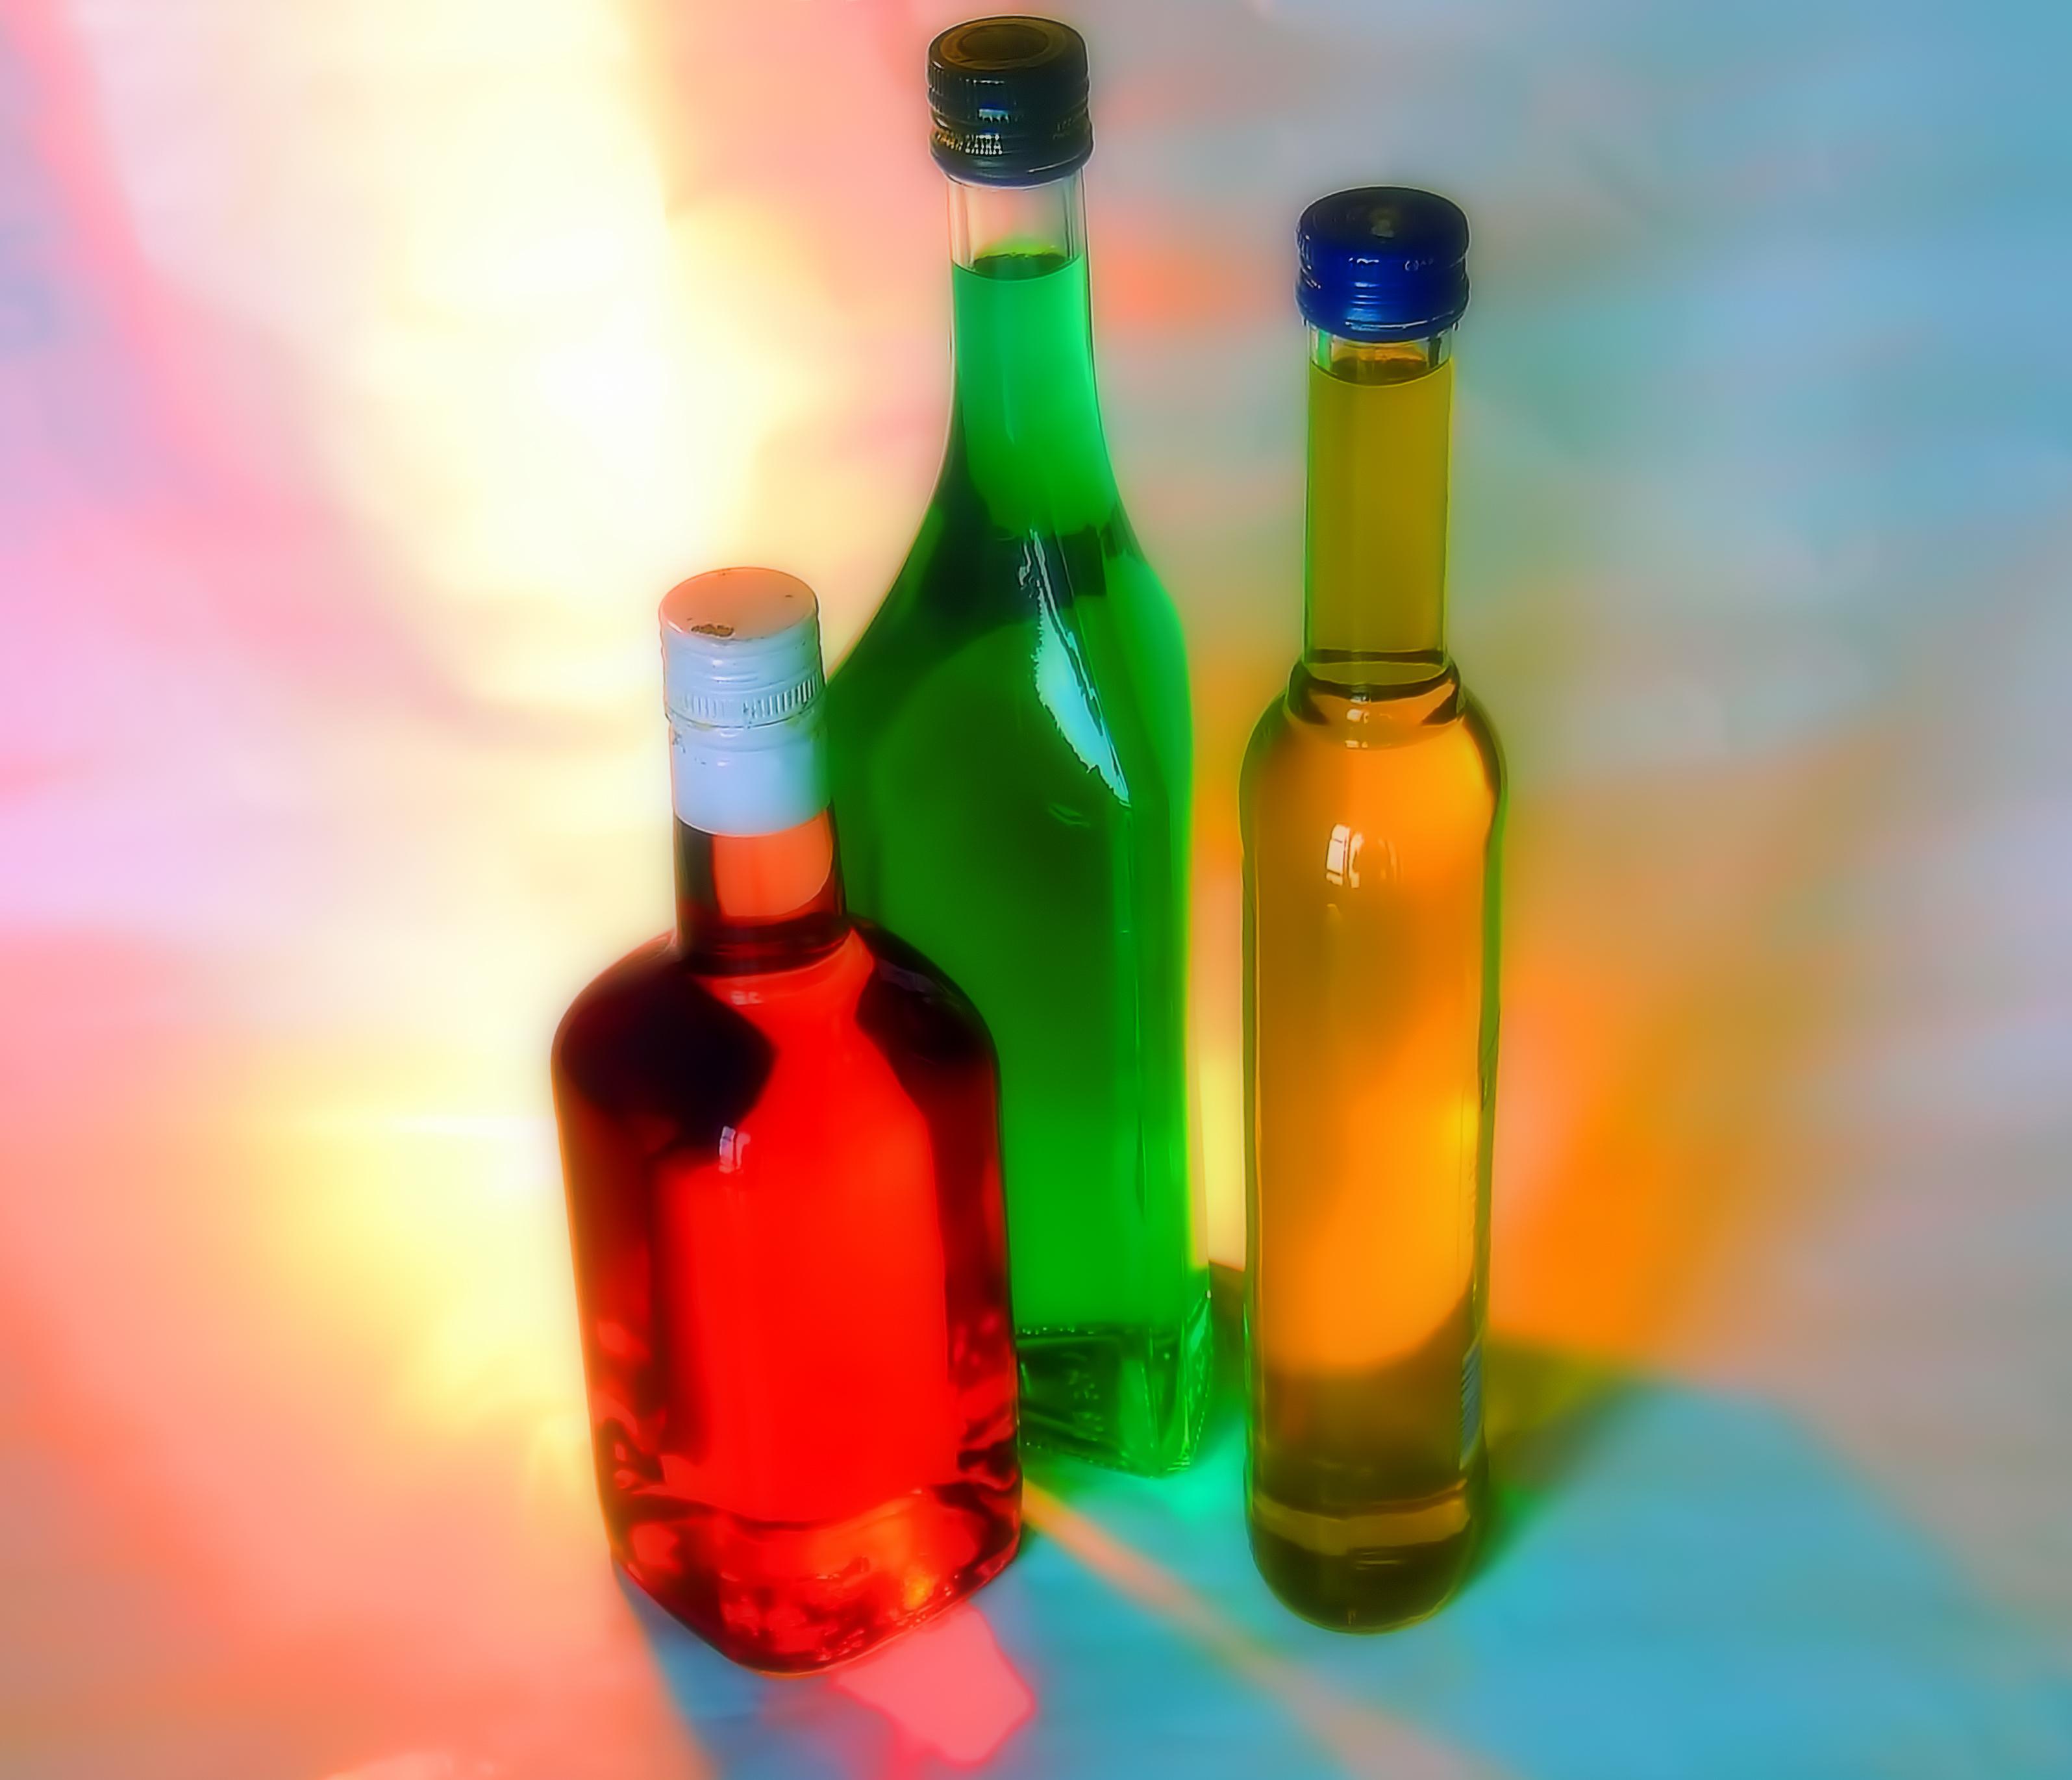 Wallpaper : bottles, red, green, yellow, drink, imagination, liquid ...